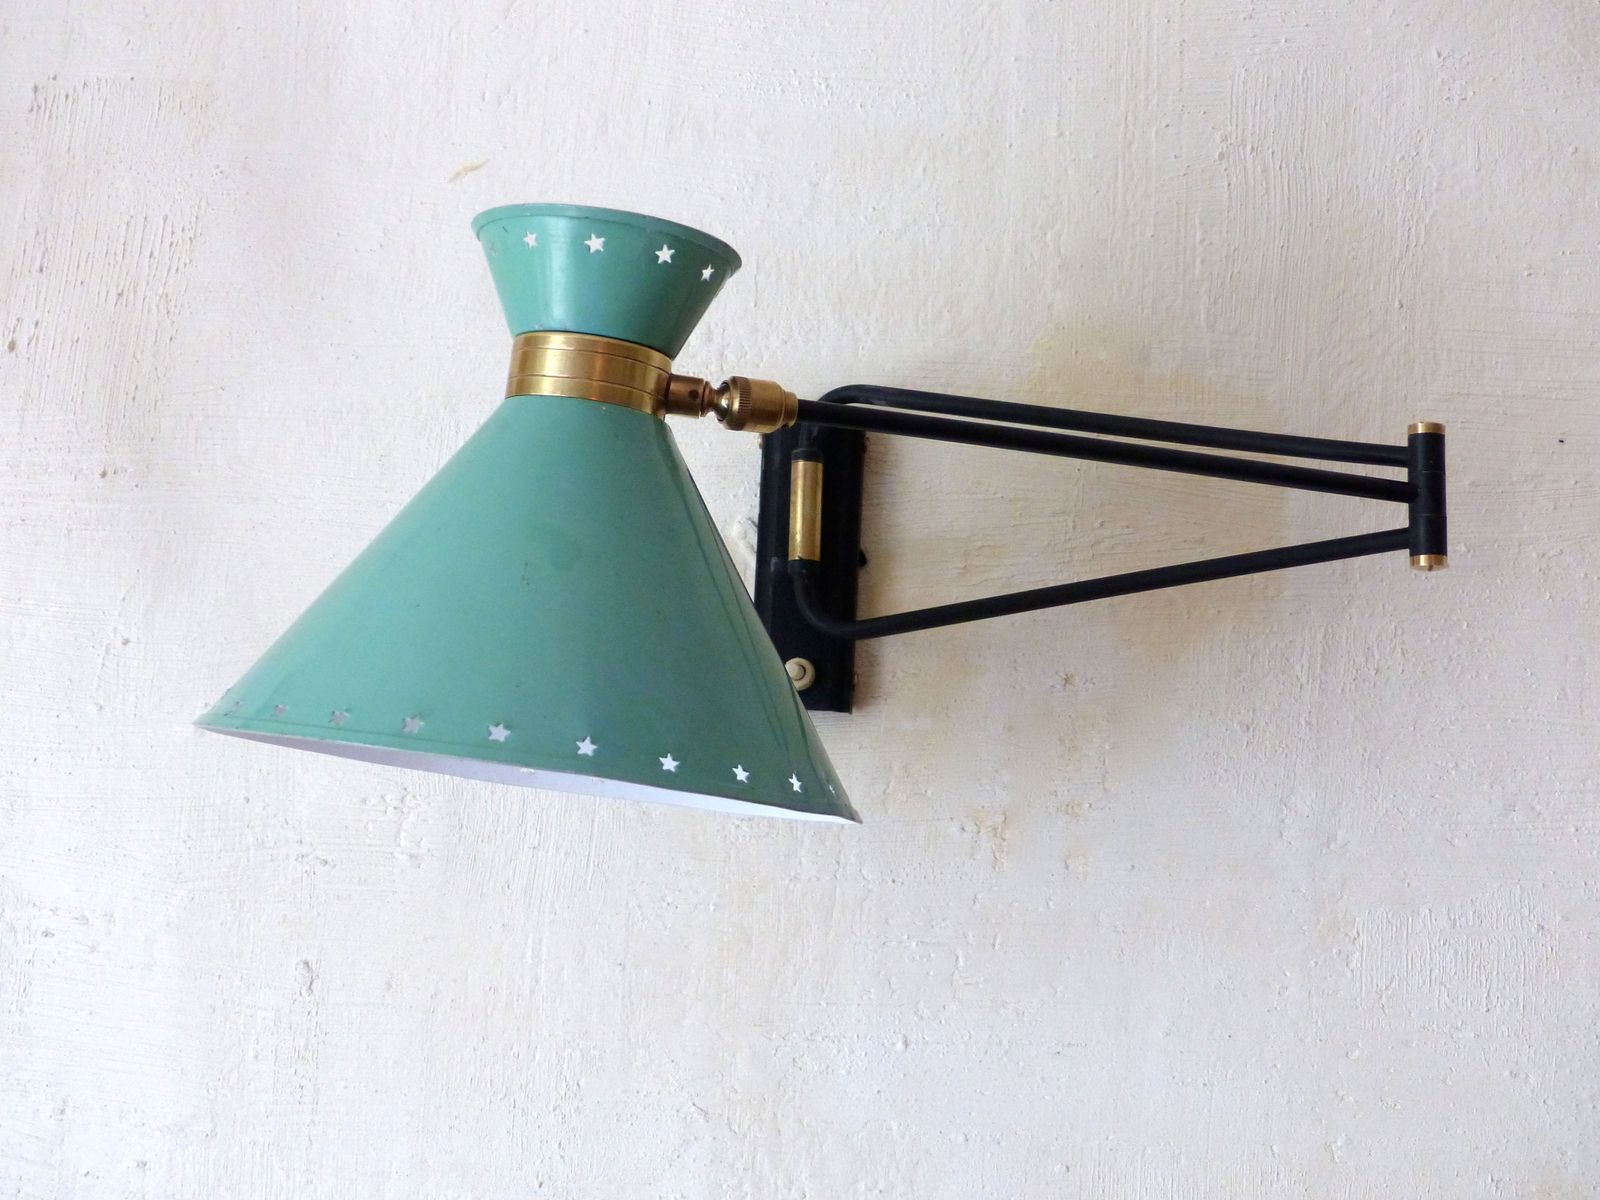 lampe murale verte menthe vintage en vente sur pamono. Black Bedroom Furniture Sets. Home Design Ideas